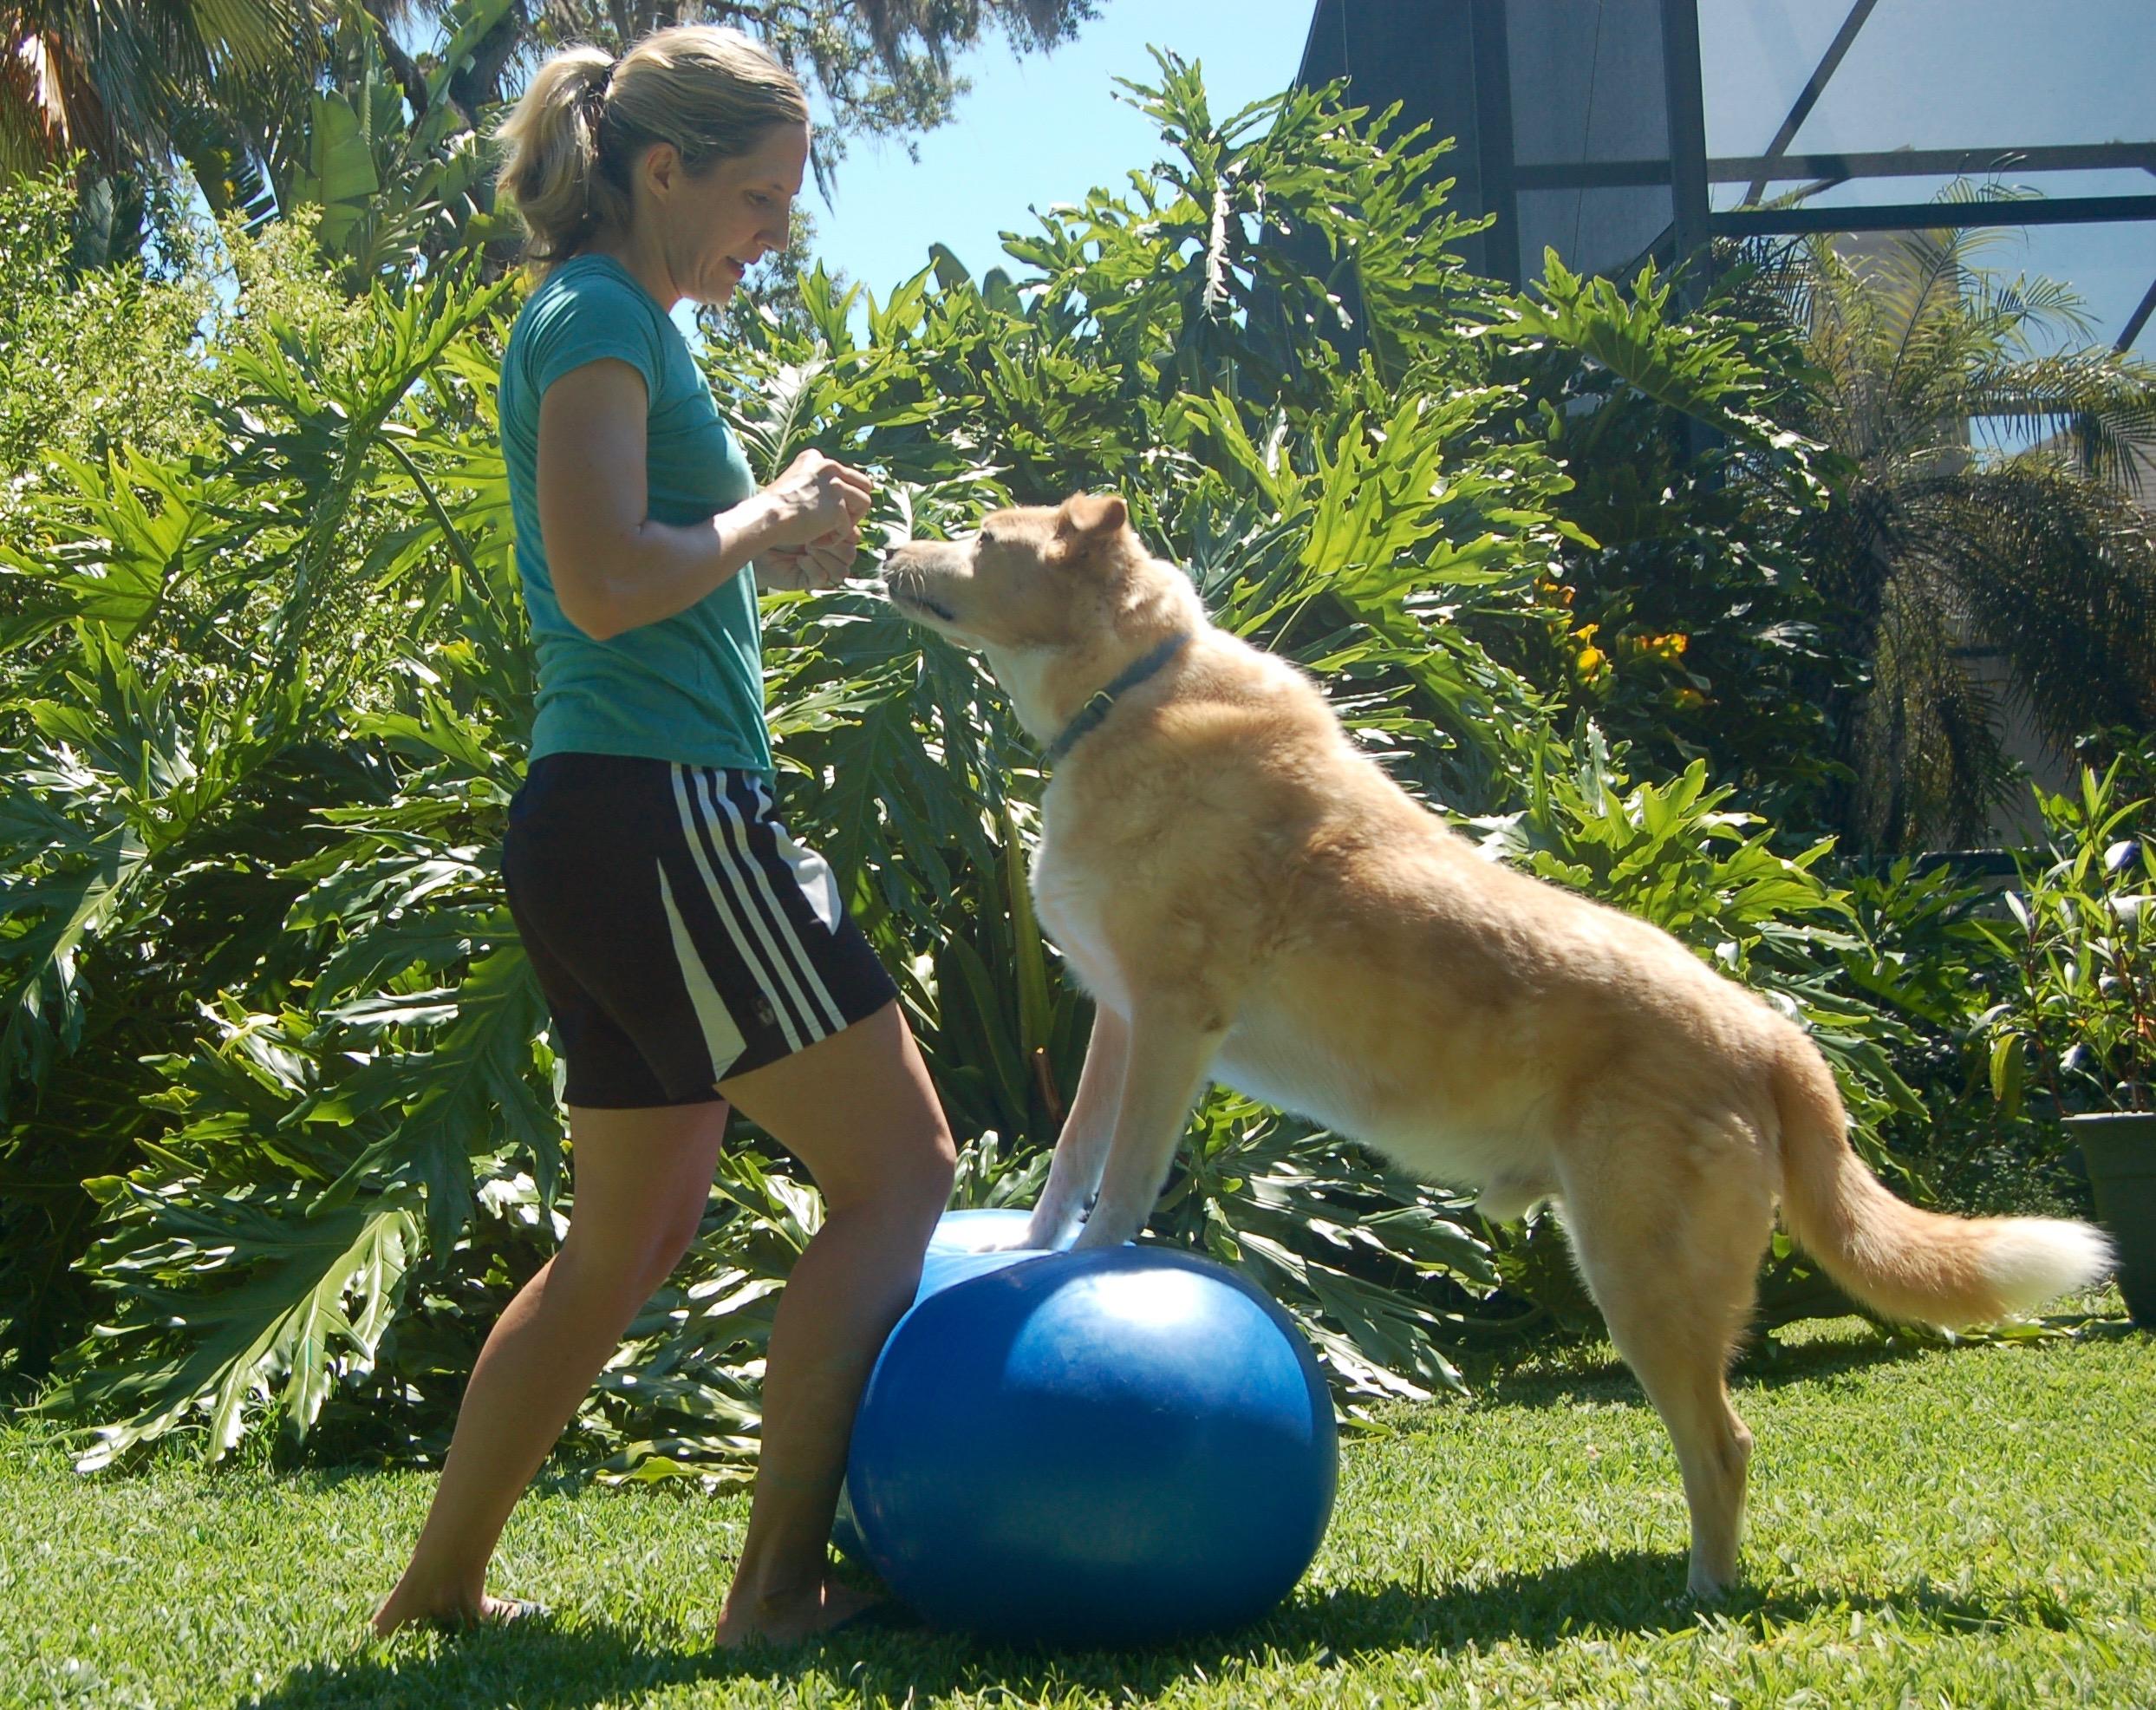 Five key aspects of canine fitness… - -Mental acuity-Balance-Strength-Cardiorespiratory fitness-Flexibility